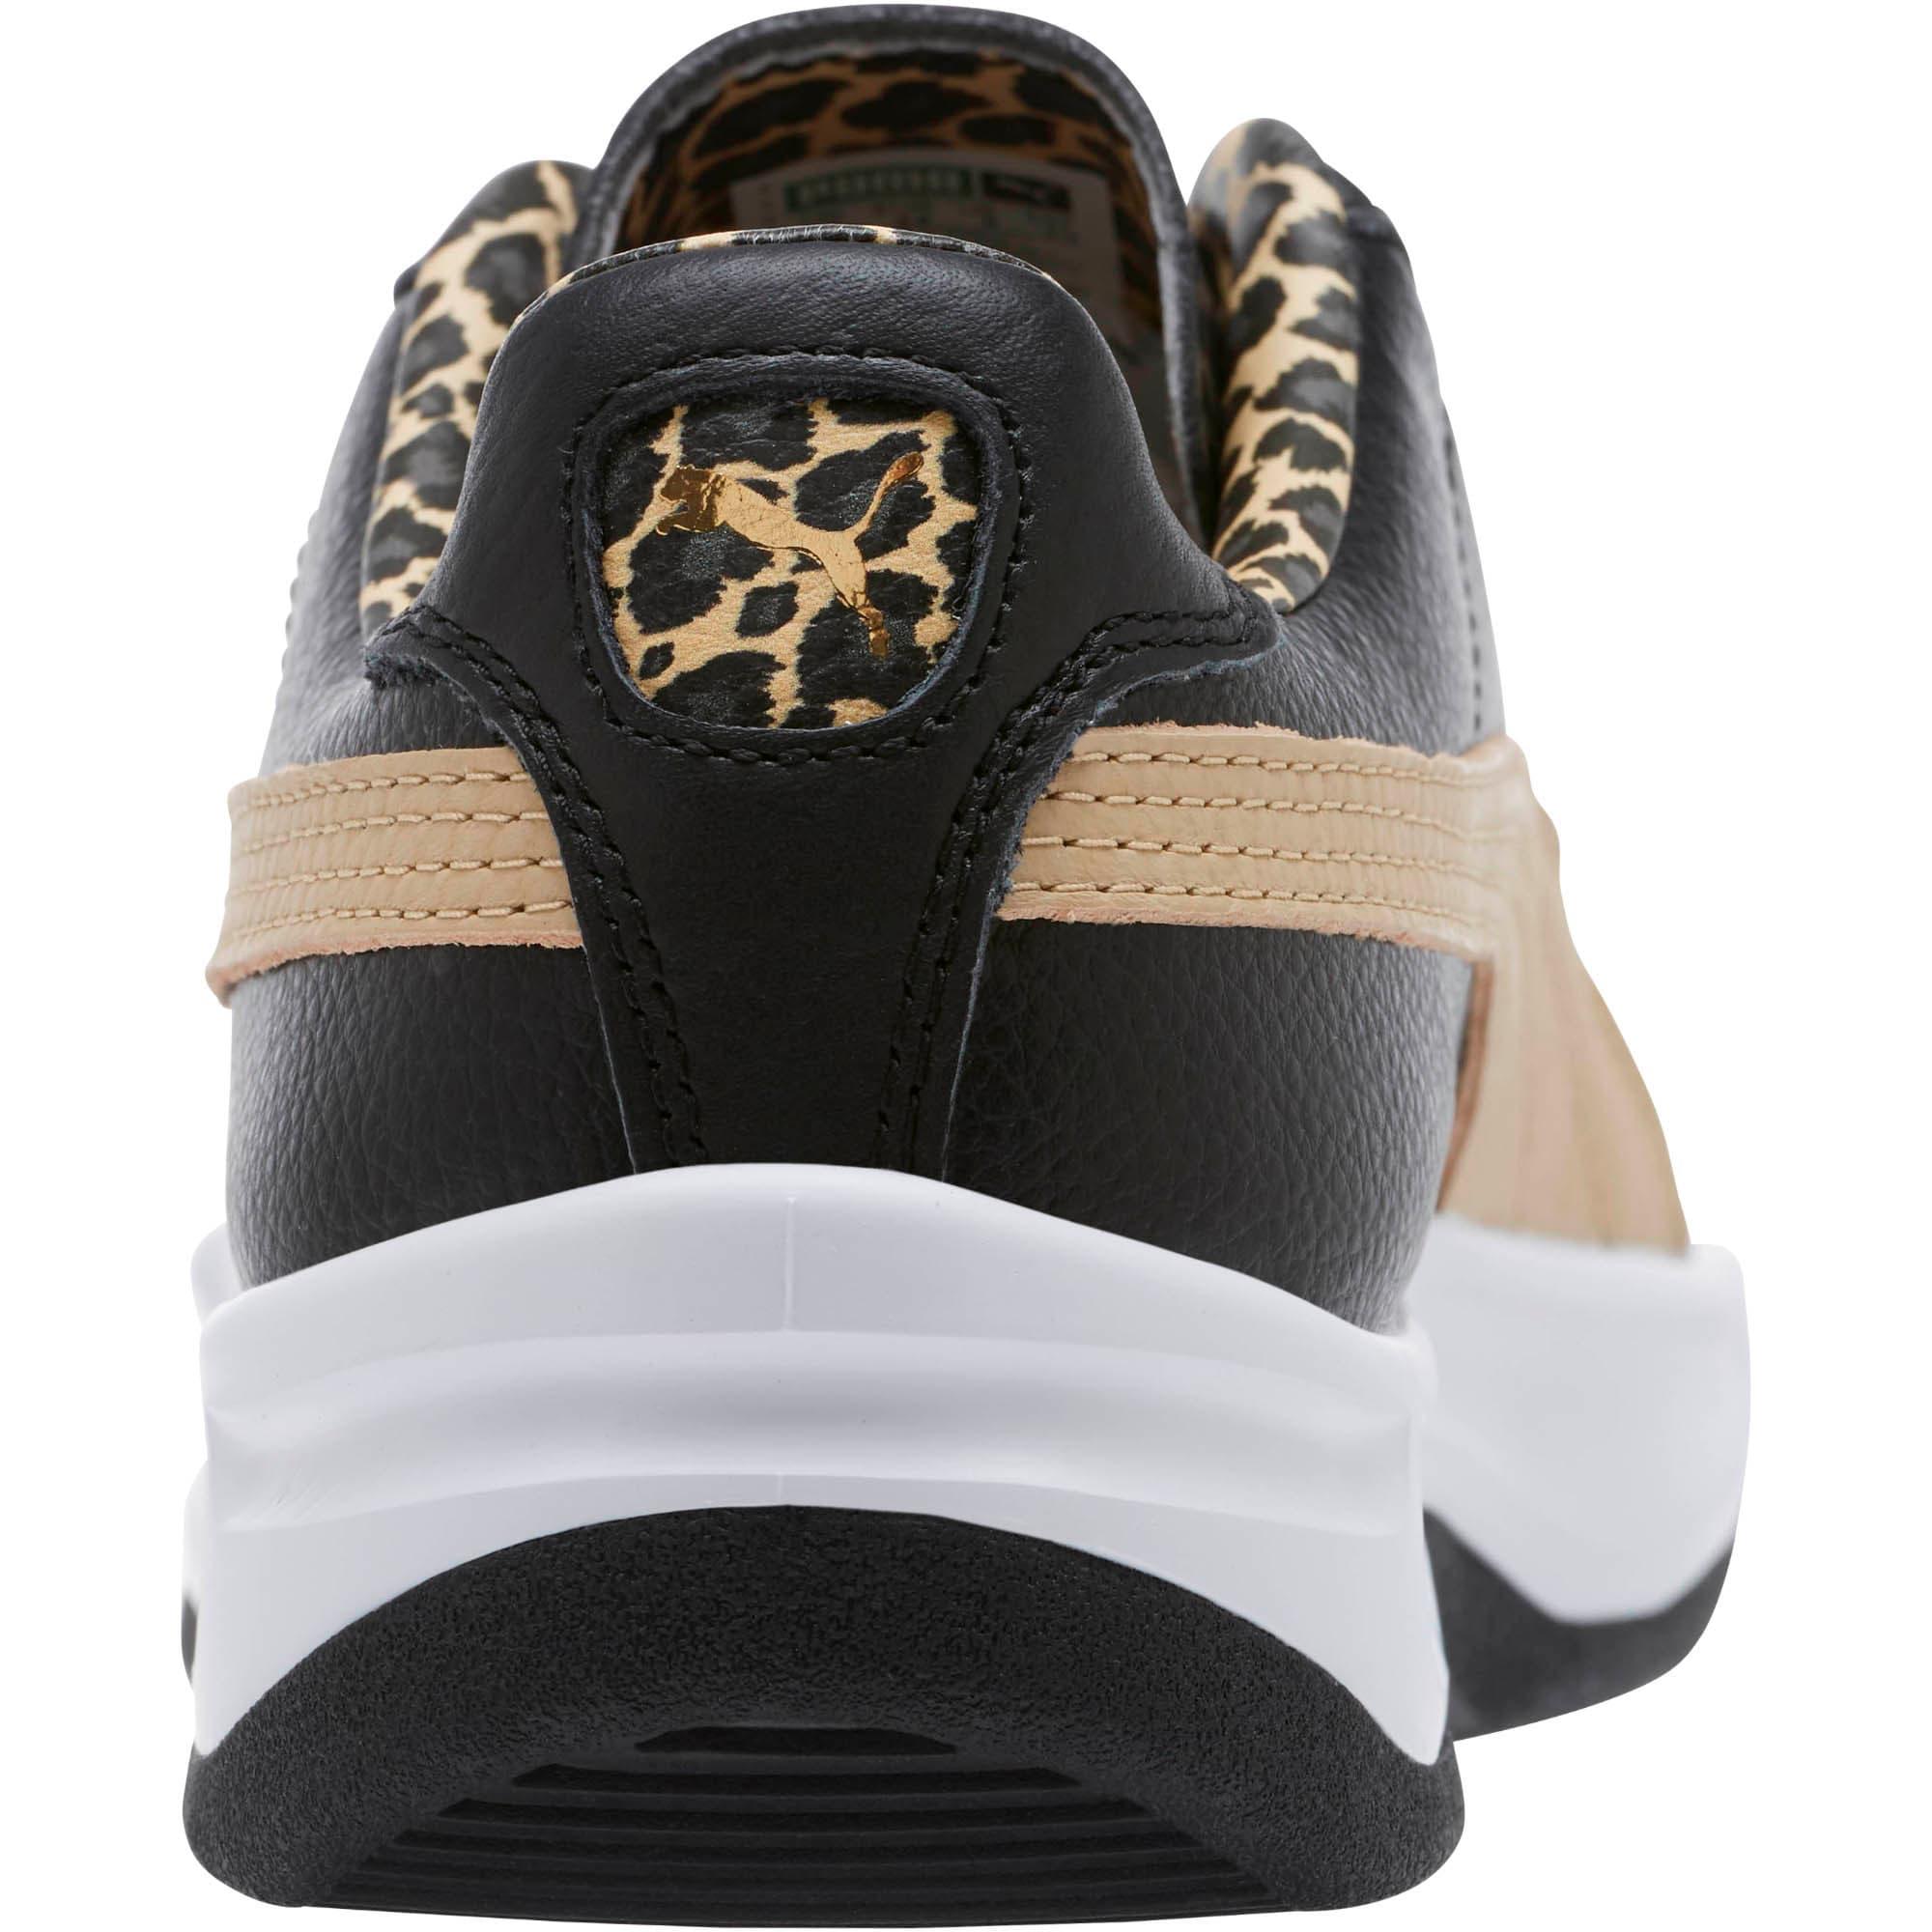 Thumbnail 4 of GV Special Wild Sneakers, Black-Pebble-Puma Team Gold, medium